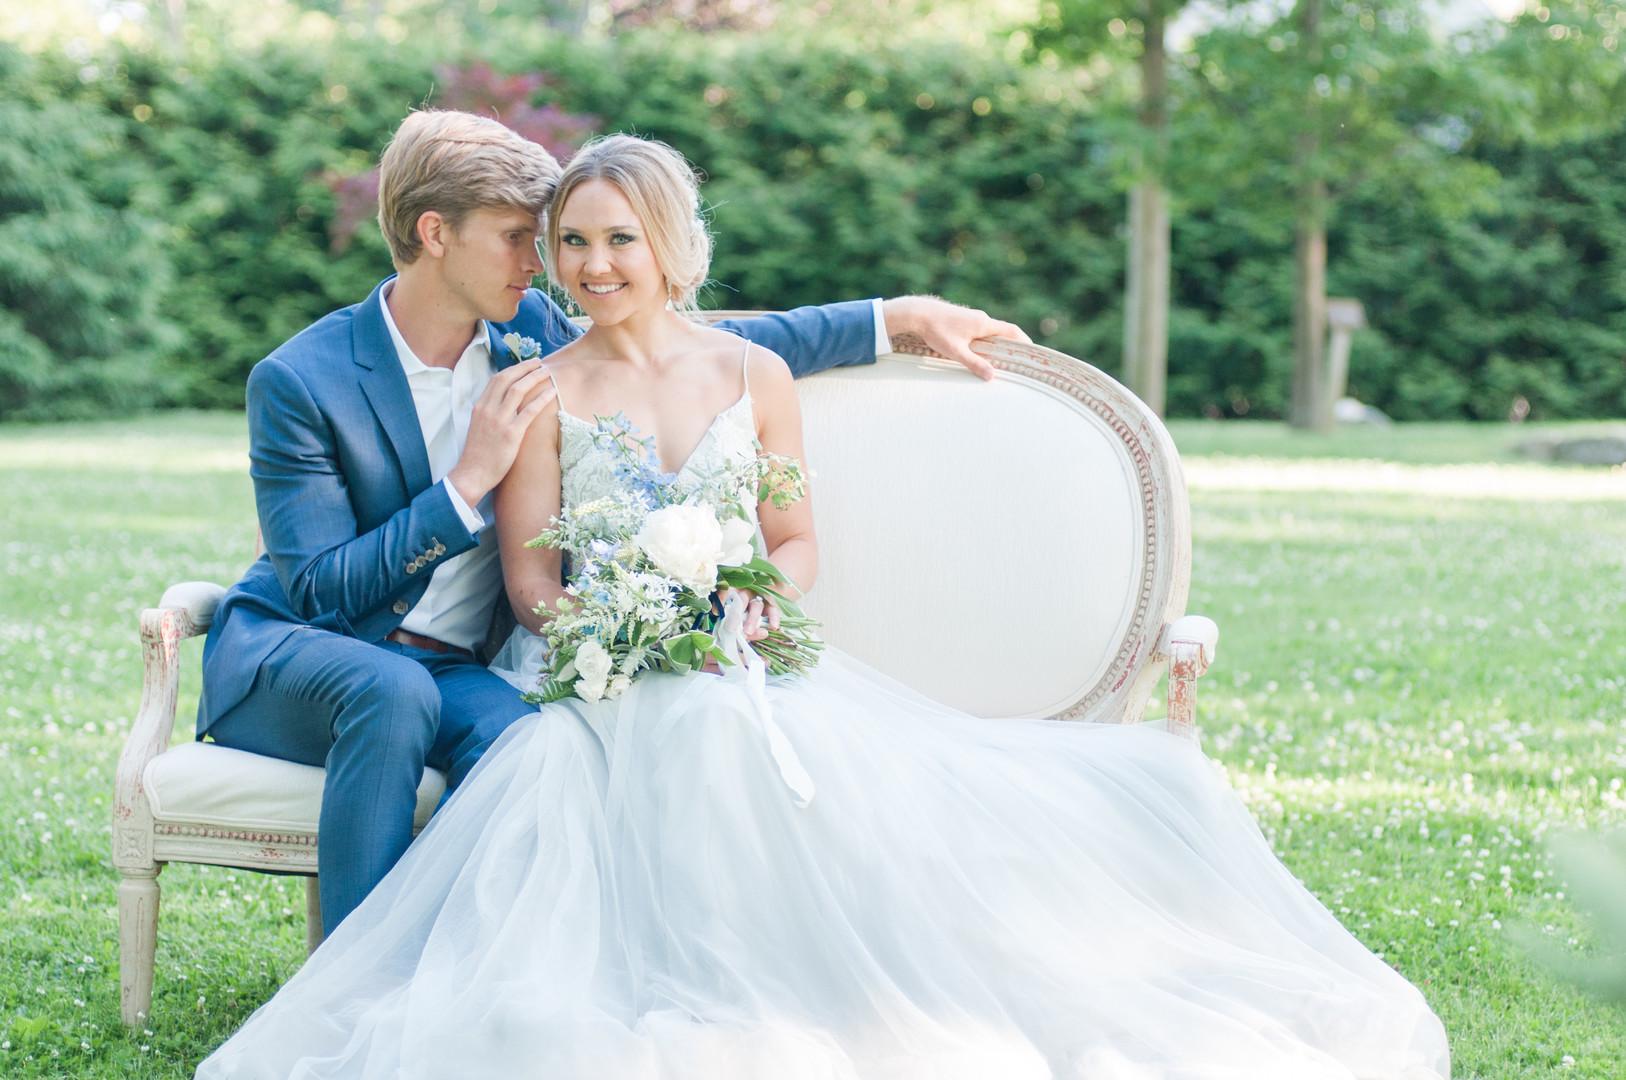 Romantic Styled Shoot at the Wainwright House